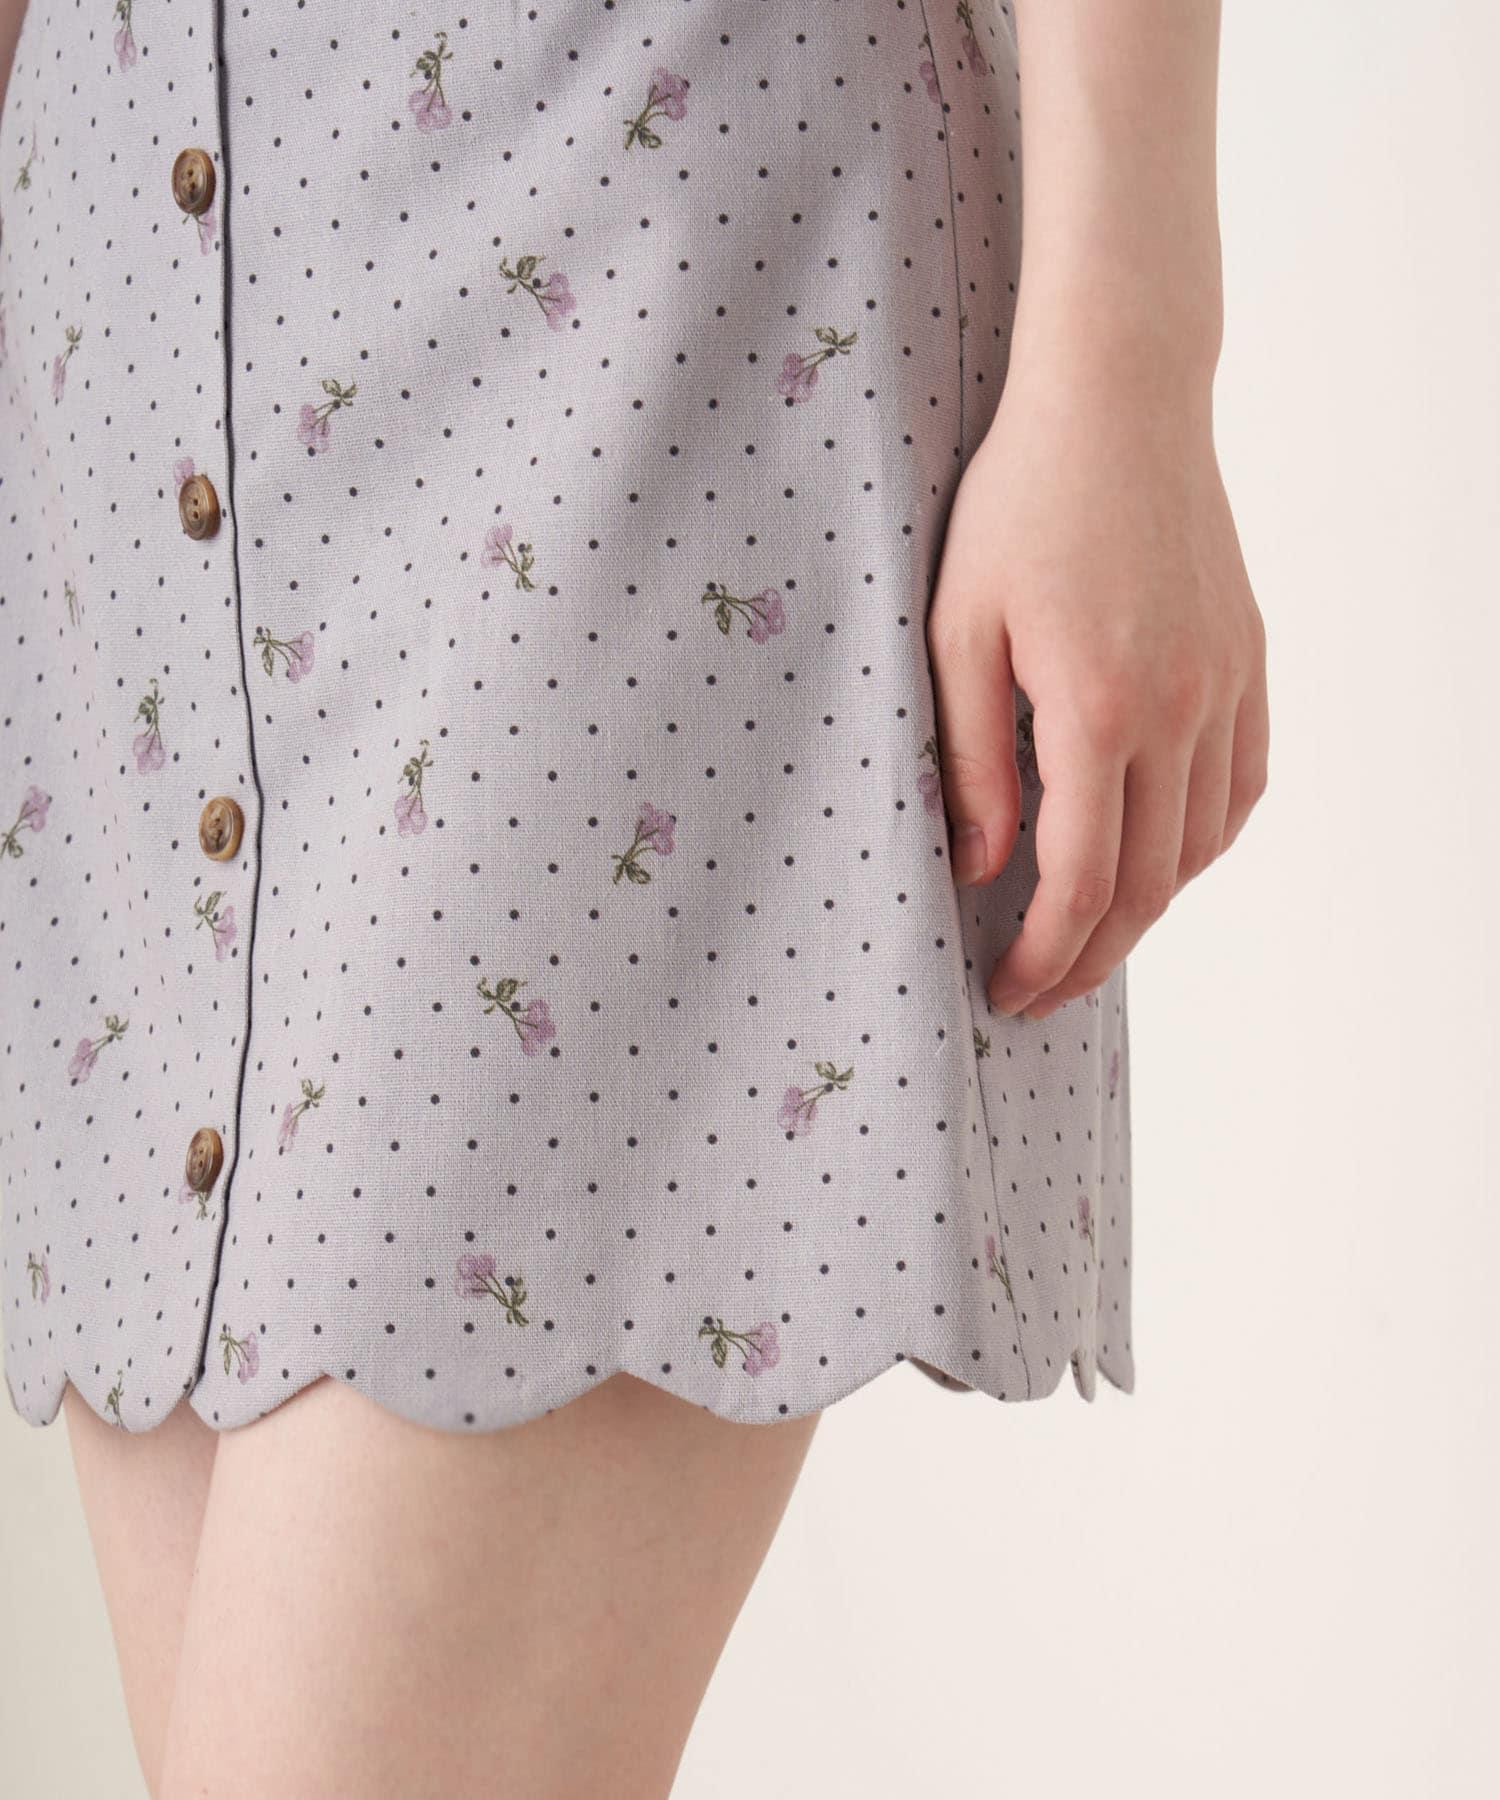 OLIVE des OLIVE(オリーブ デ オリーブ) CuteCherry裾スカラミニスカート